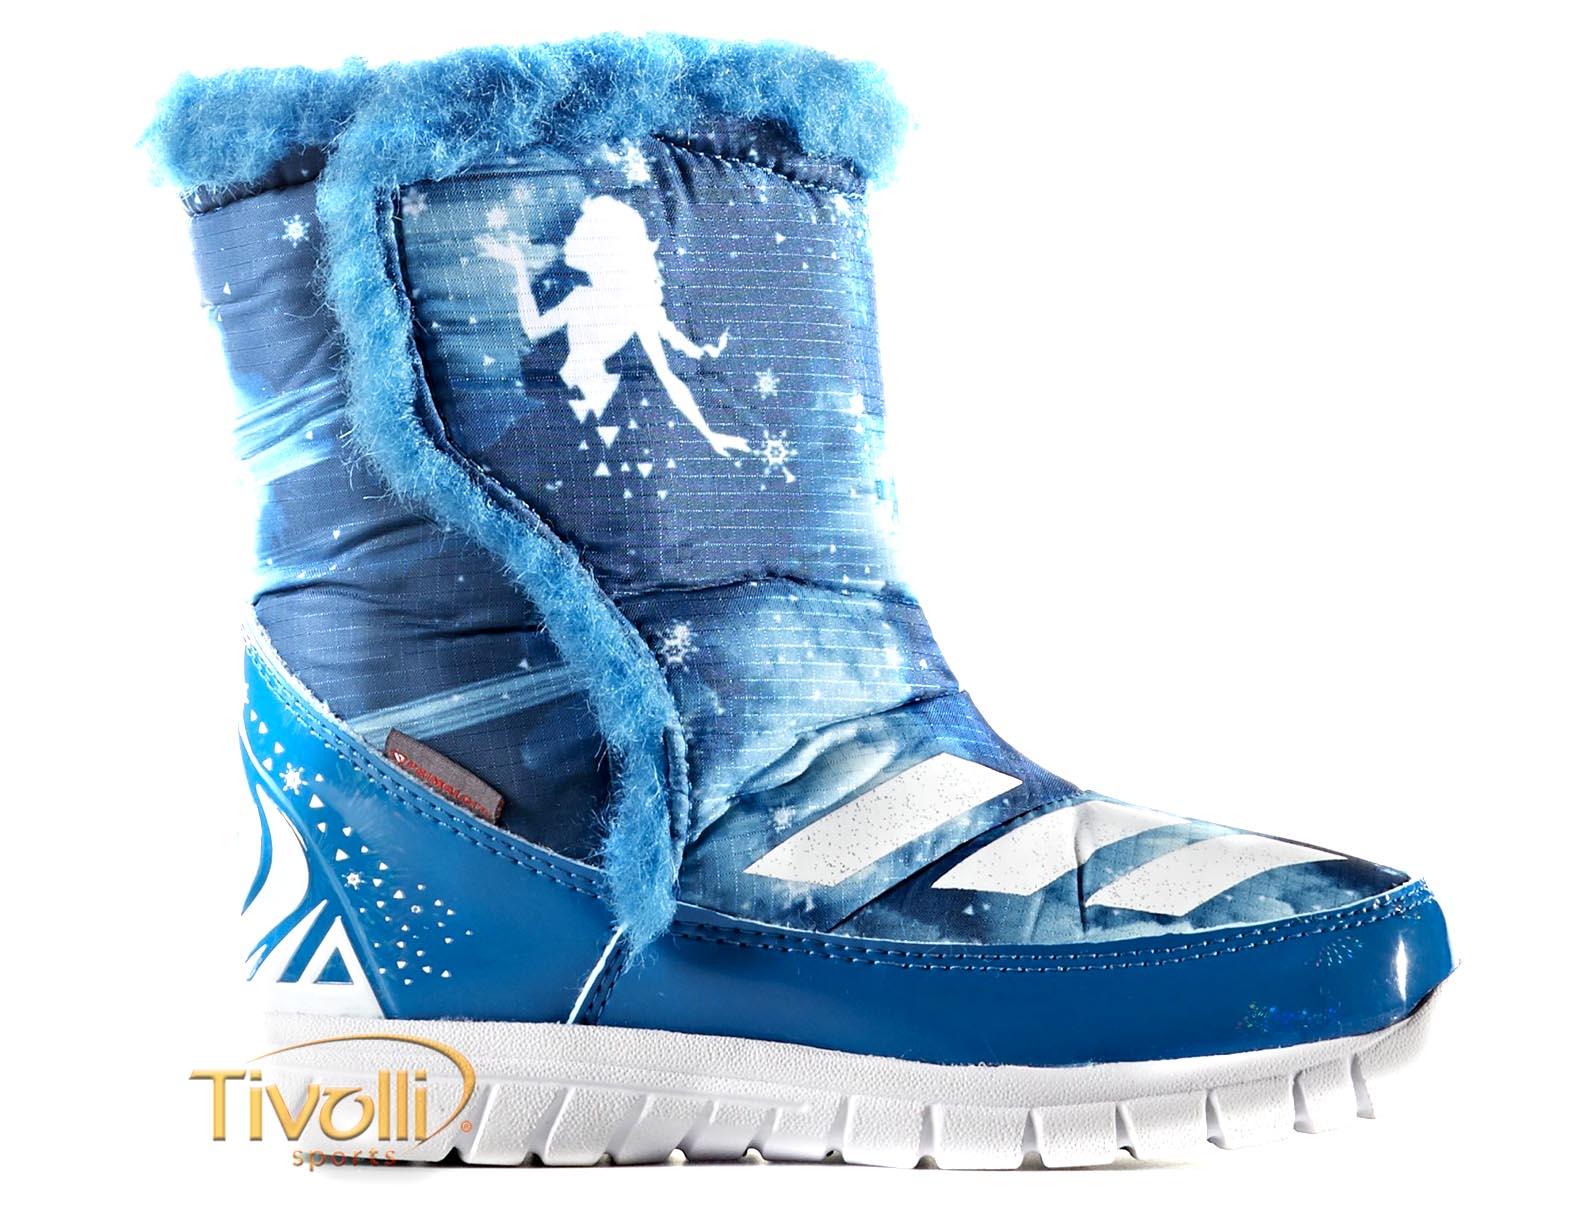 74510ade07a Bota Adidas Mid Disney Frozen Infantil   tam. 19 ao 25